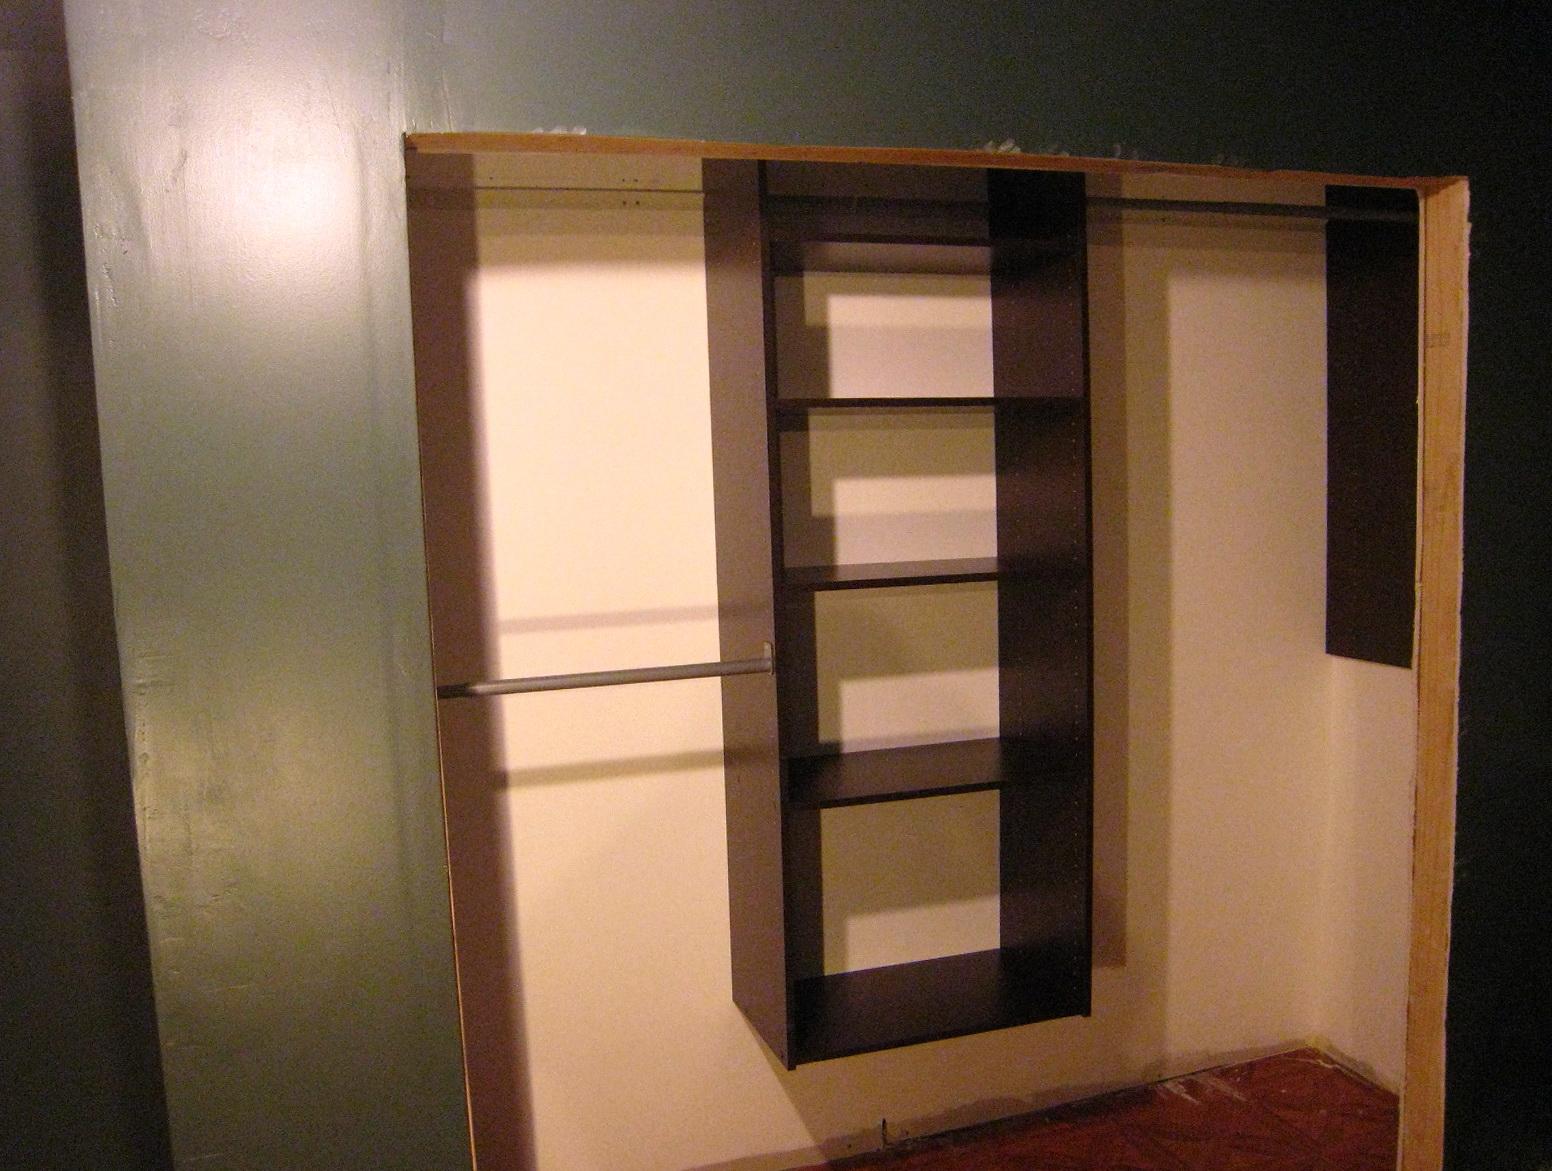 amp depot minimalist closet interior the complaints reviews installation cost home top elegant and about door doors